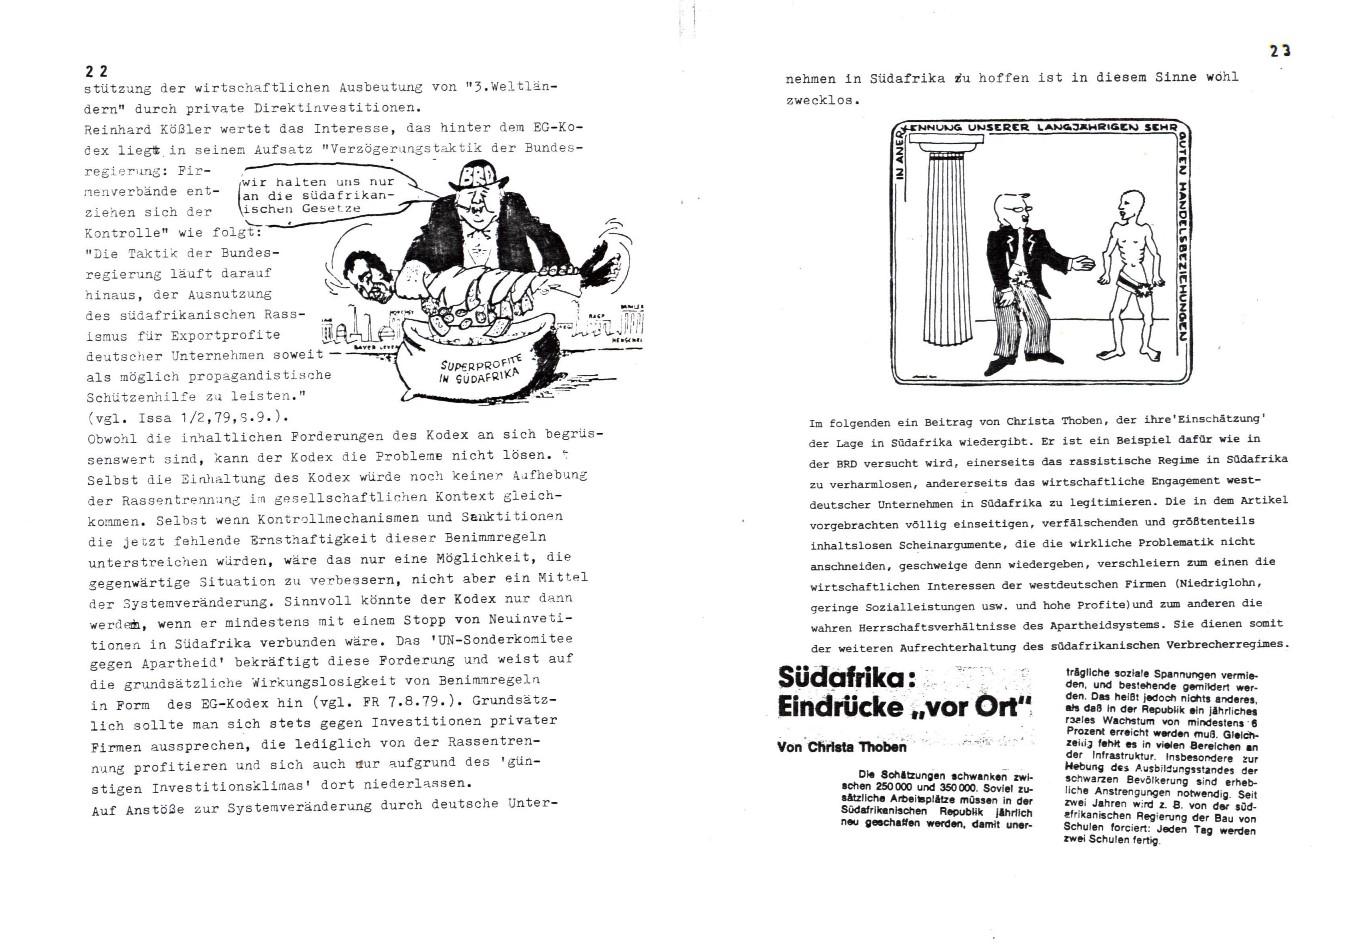 Muenster_AKAFRIK_1981_Suedafrika_BRD_13